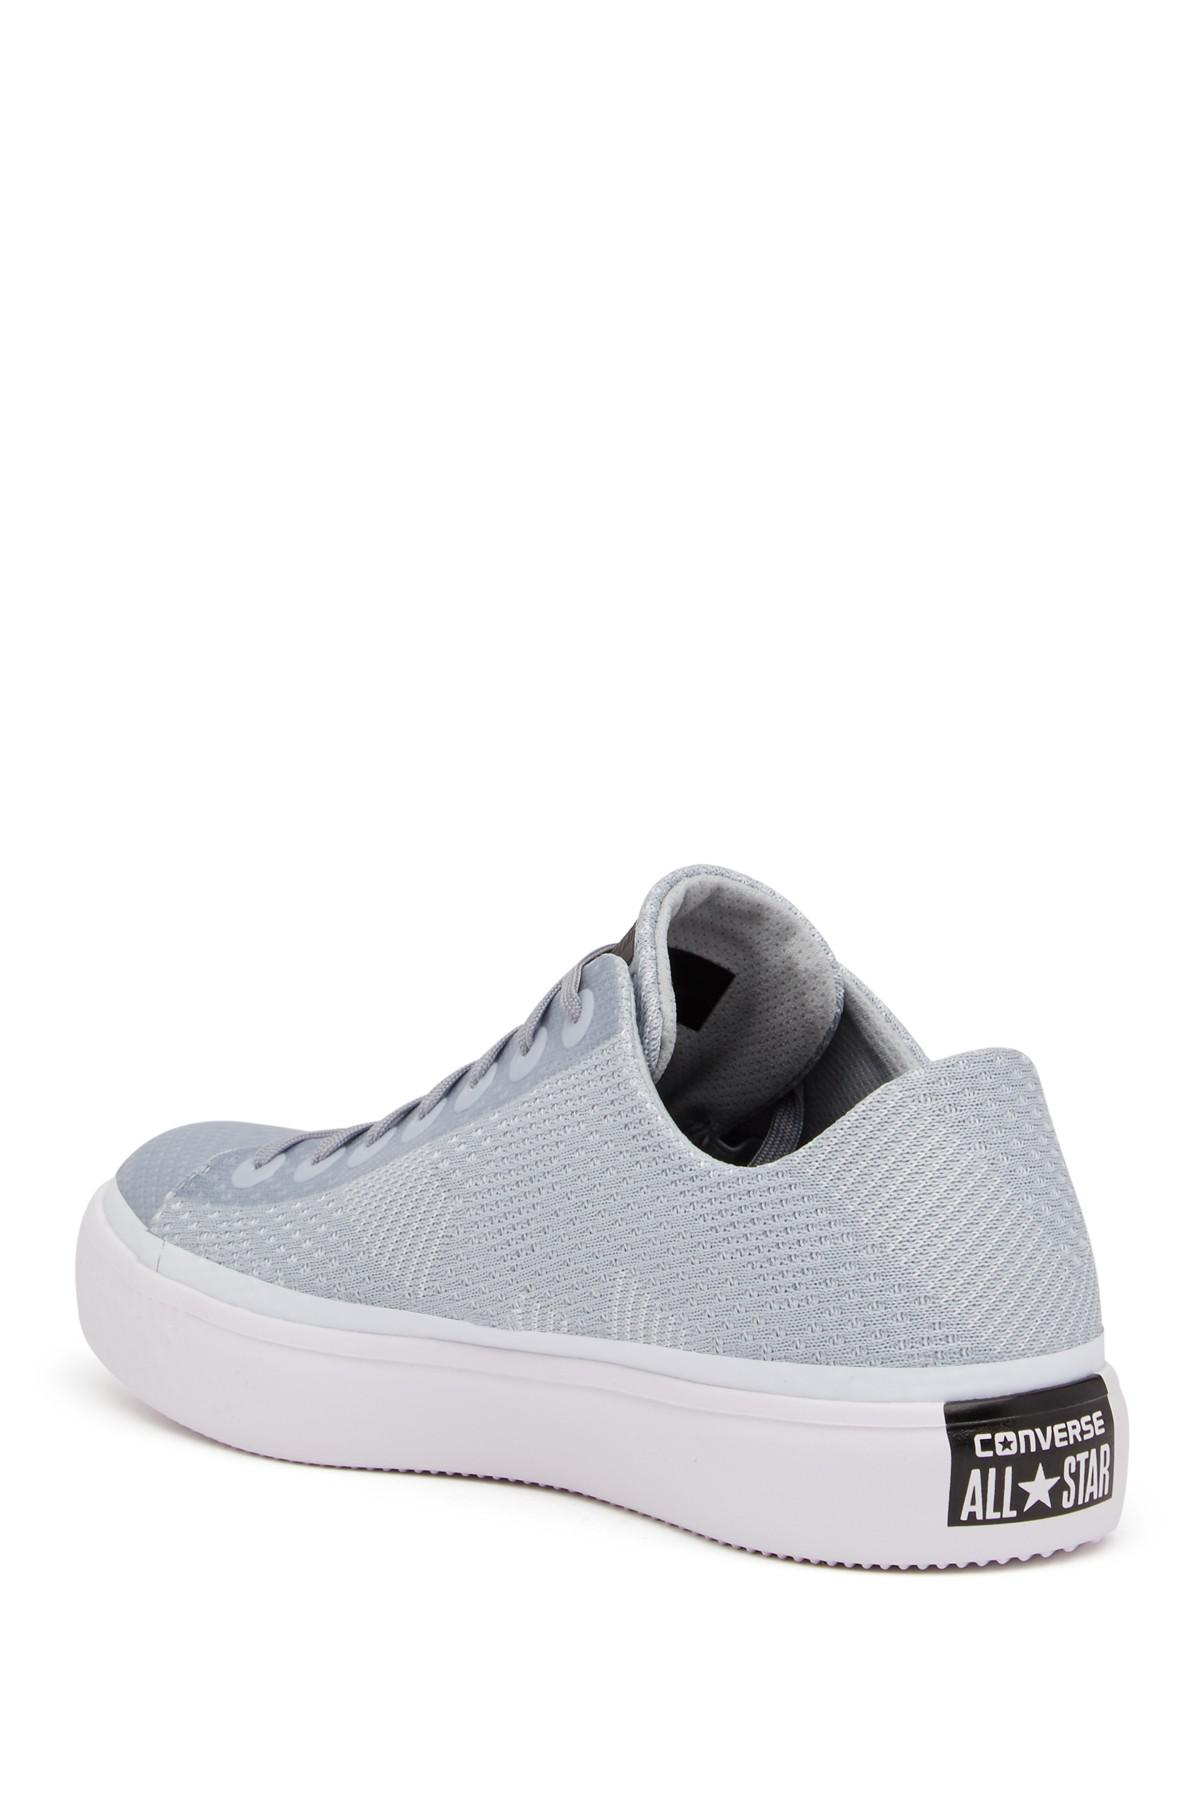 f74e480bedec Converse Chuck Taylor All Star Modern Oxford Sneaker (unisex) in ...